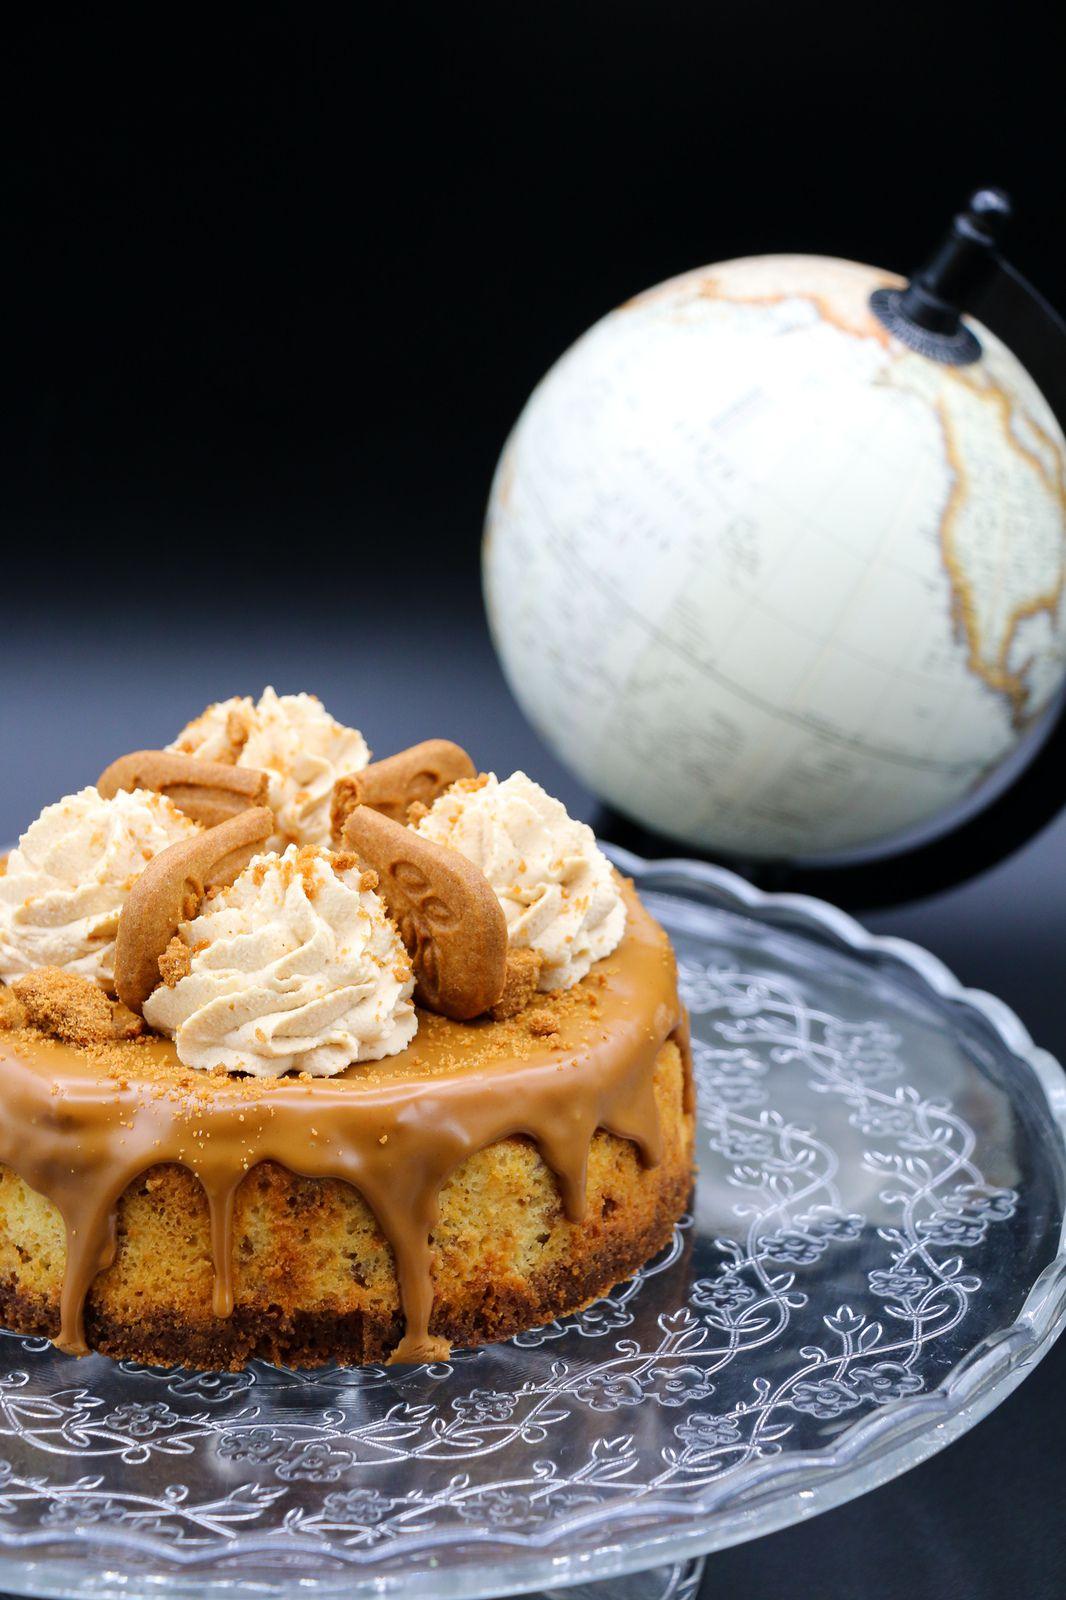 Cheese-cake de New-York au spéculoos